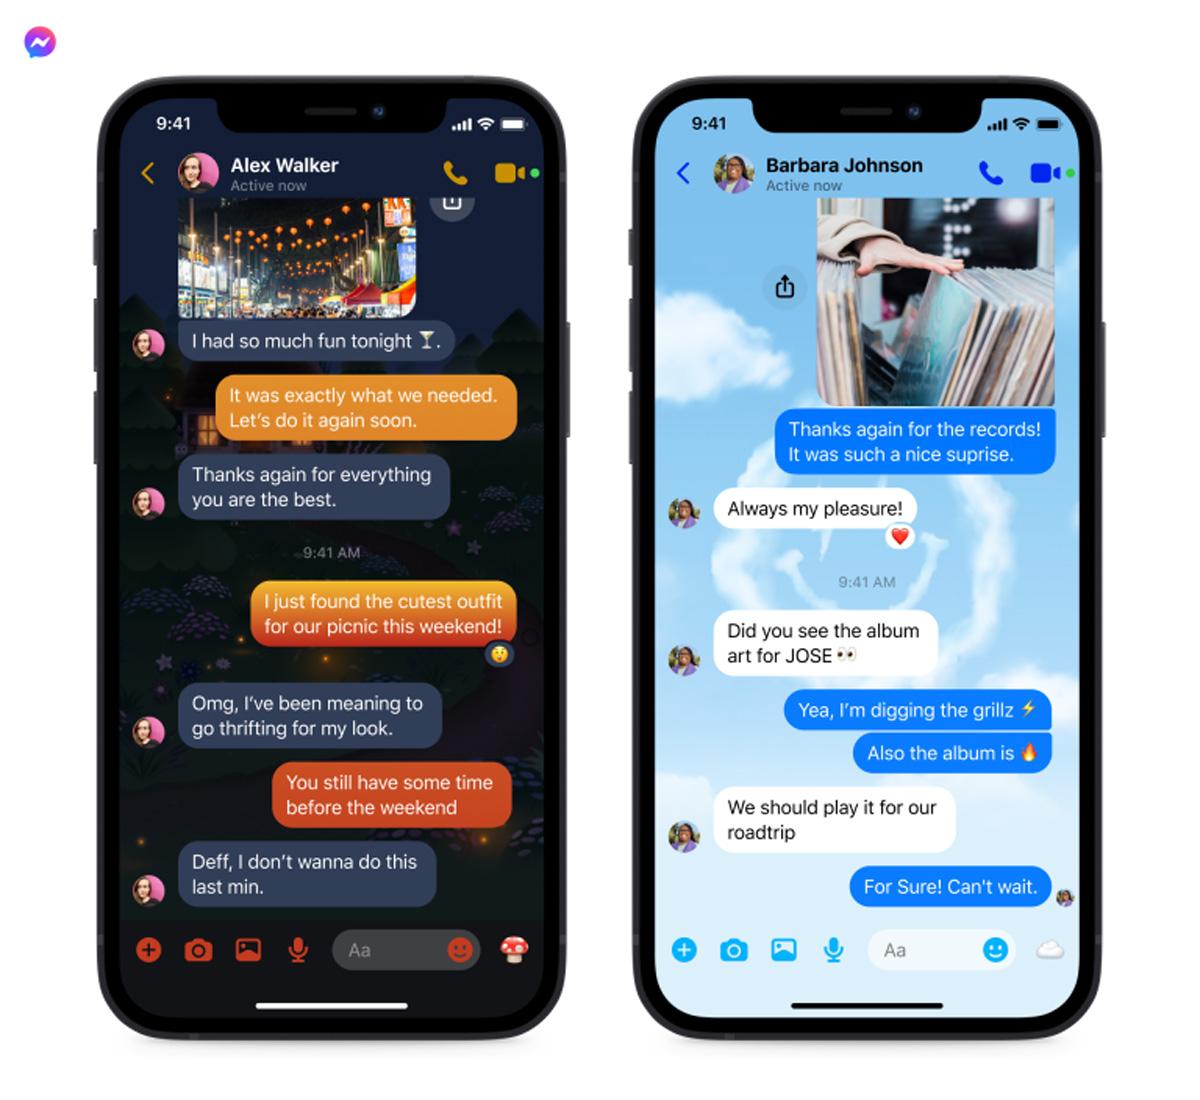 Facebook Instagram Messenger Cross-Platform Group Chat Feature